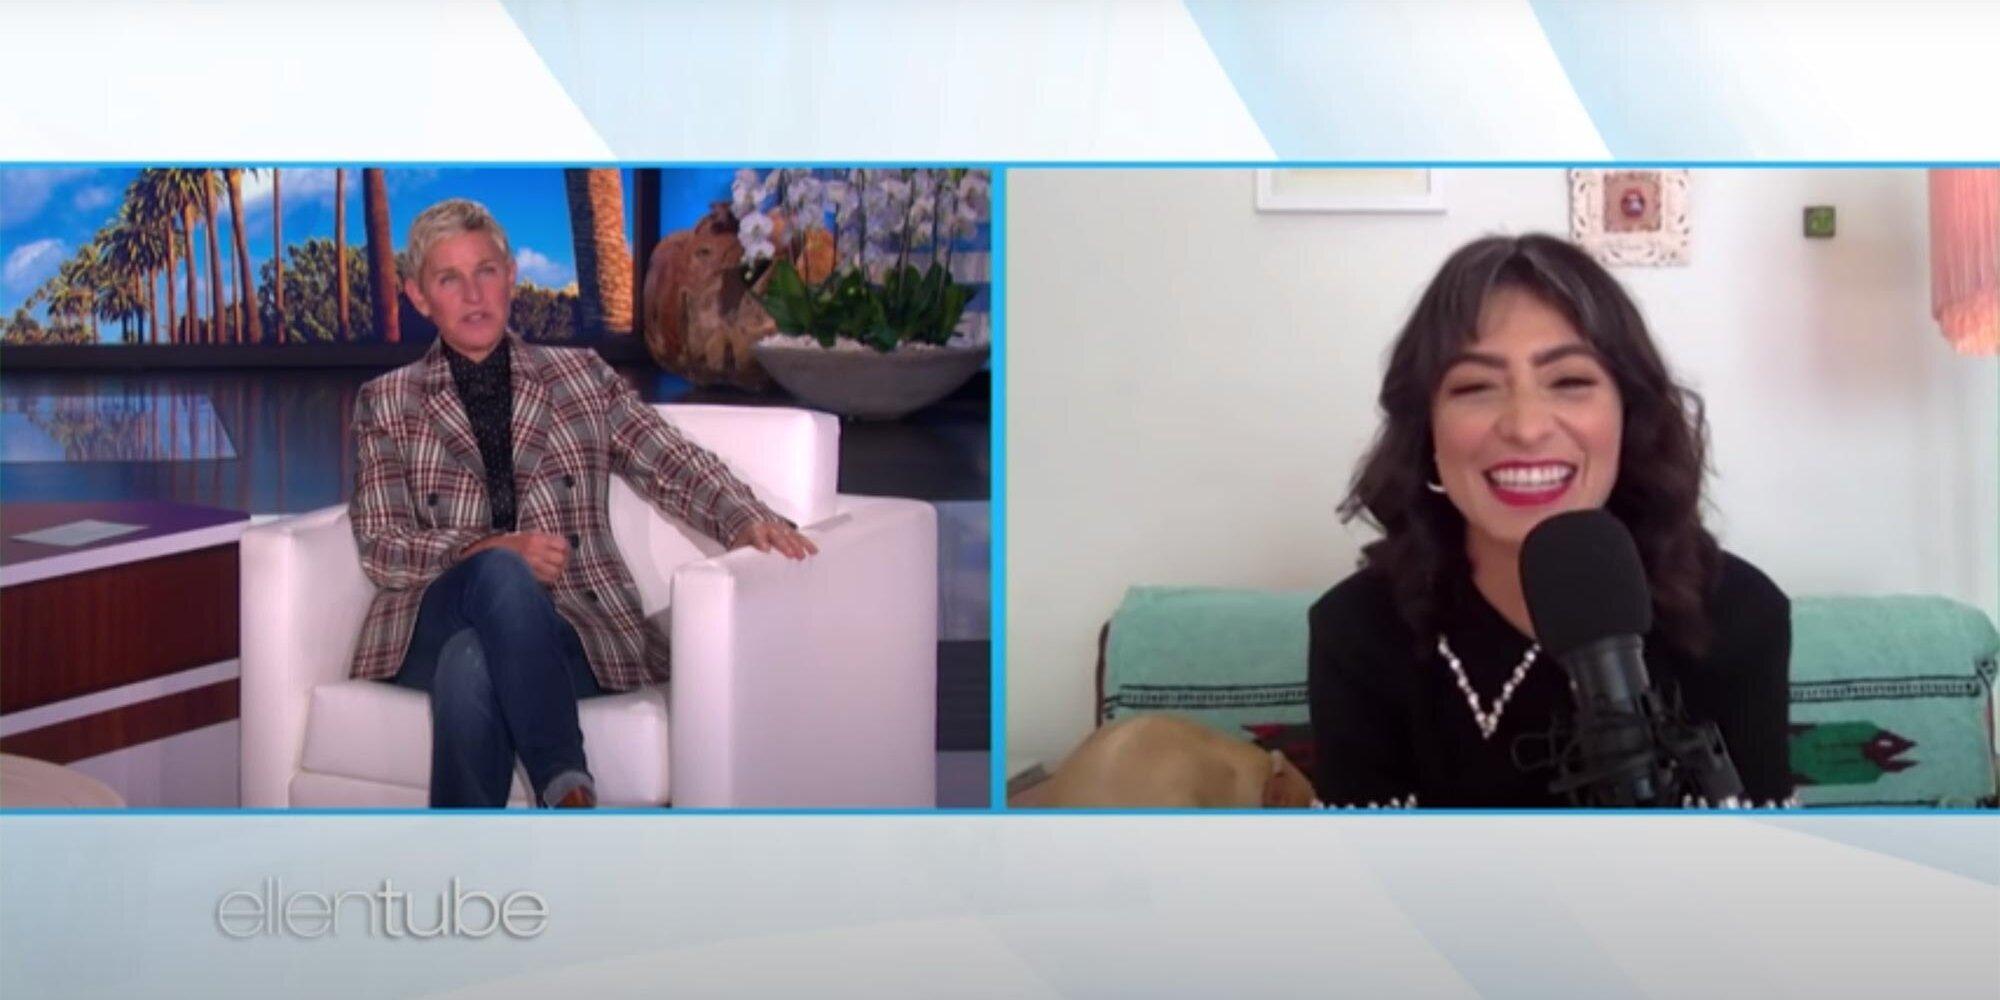 Watch SNL star Melissa Villaseñor do her Ellen DeGeneres impression for Ellen DeGeneres.jpg